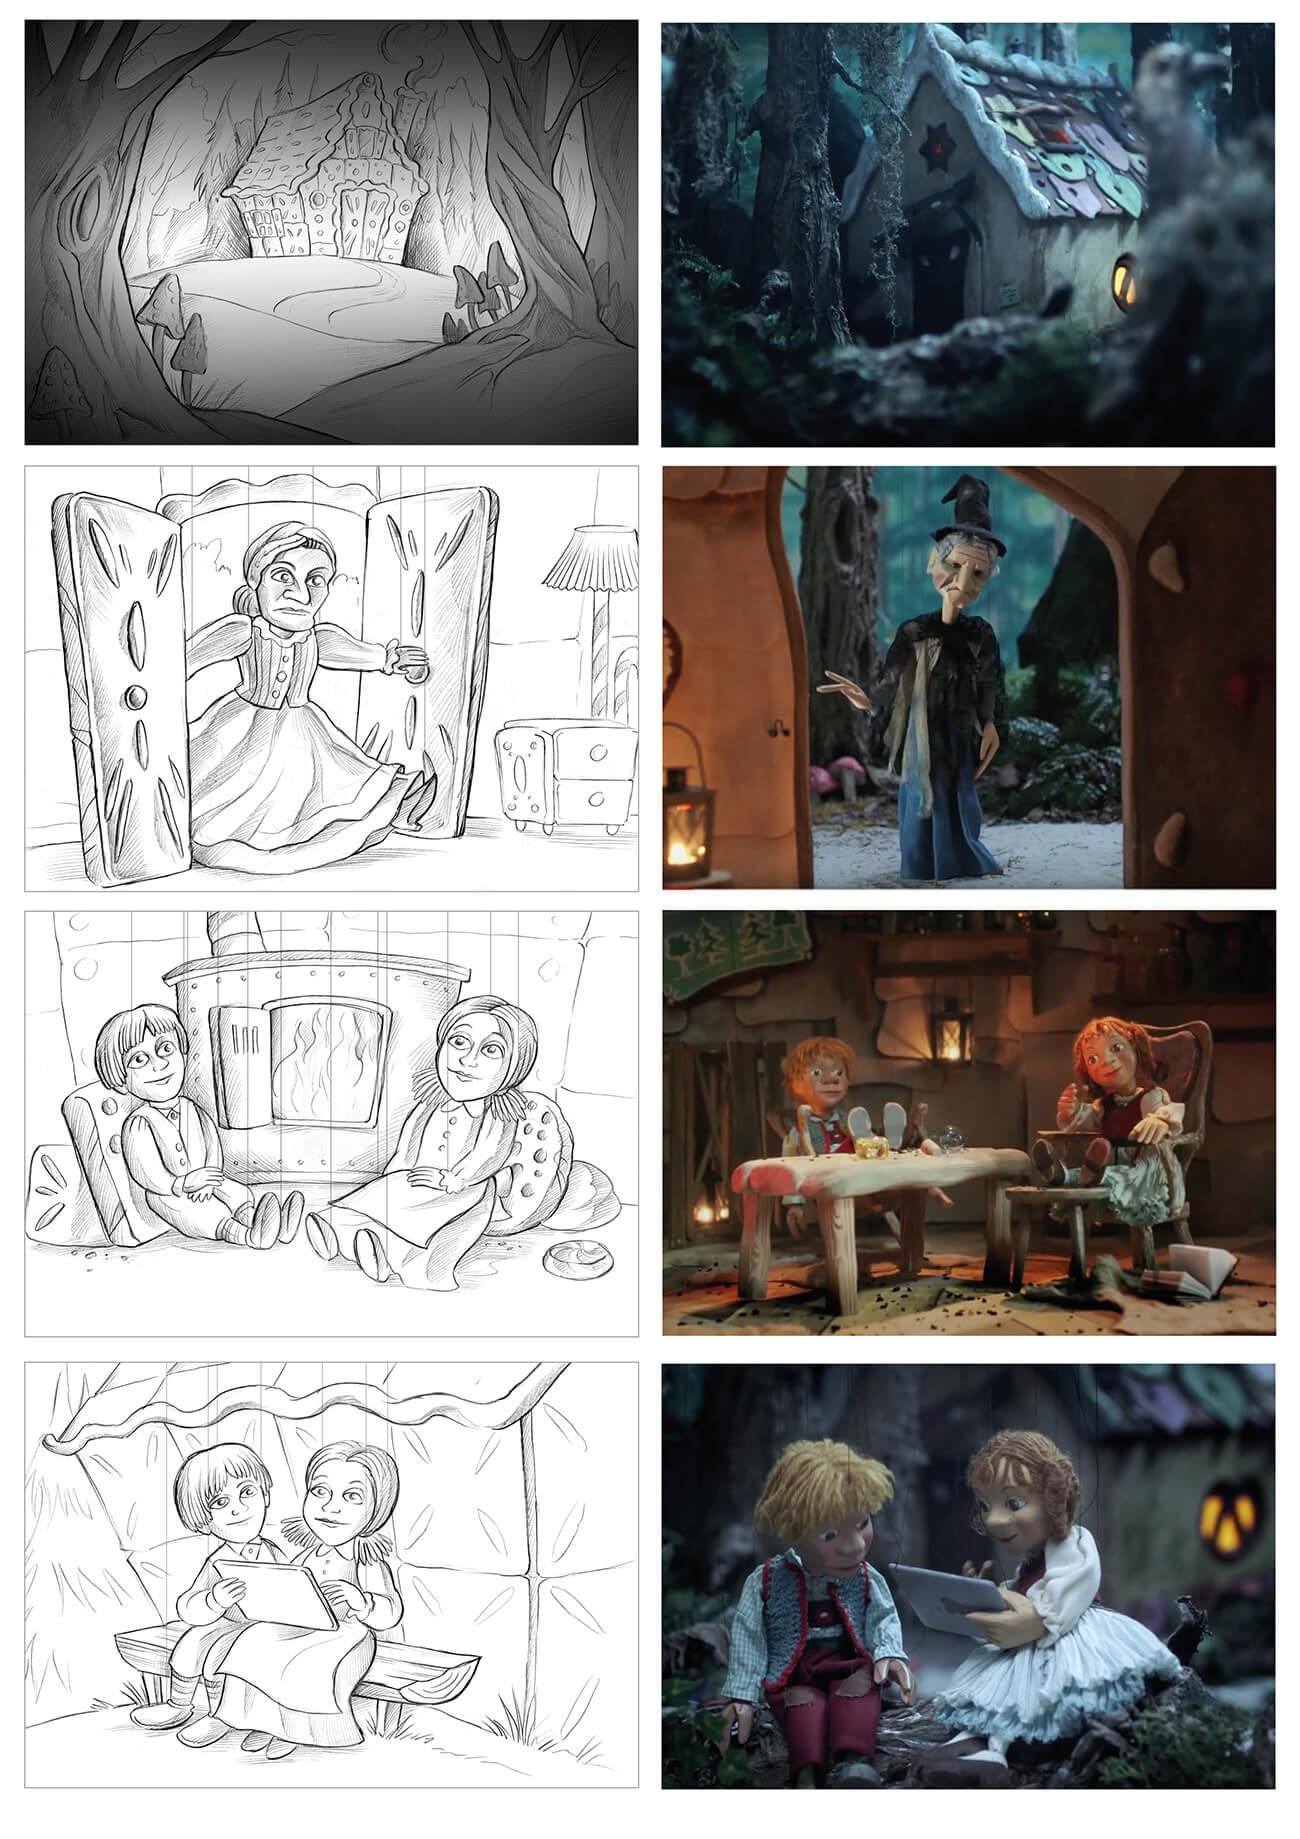 Minijob_Storyboard_1_Webt